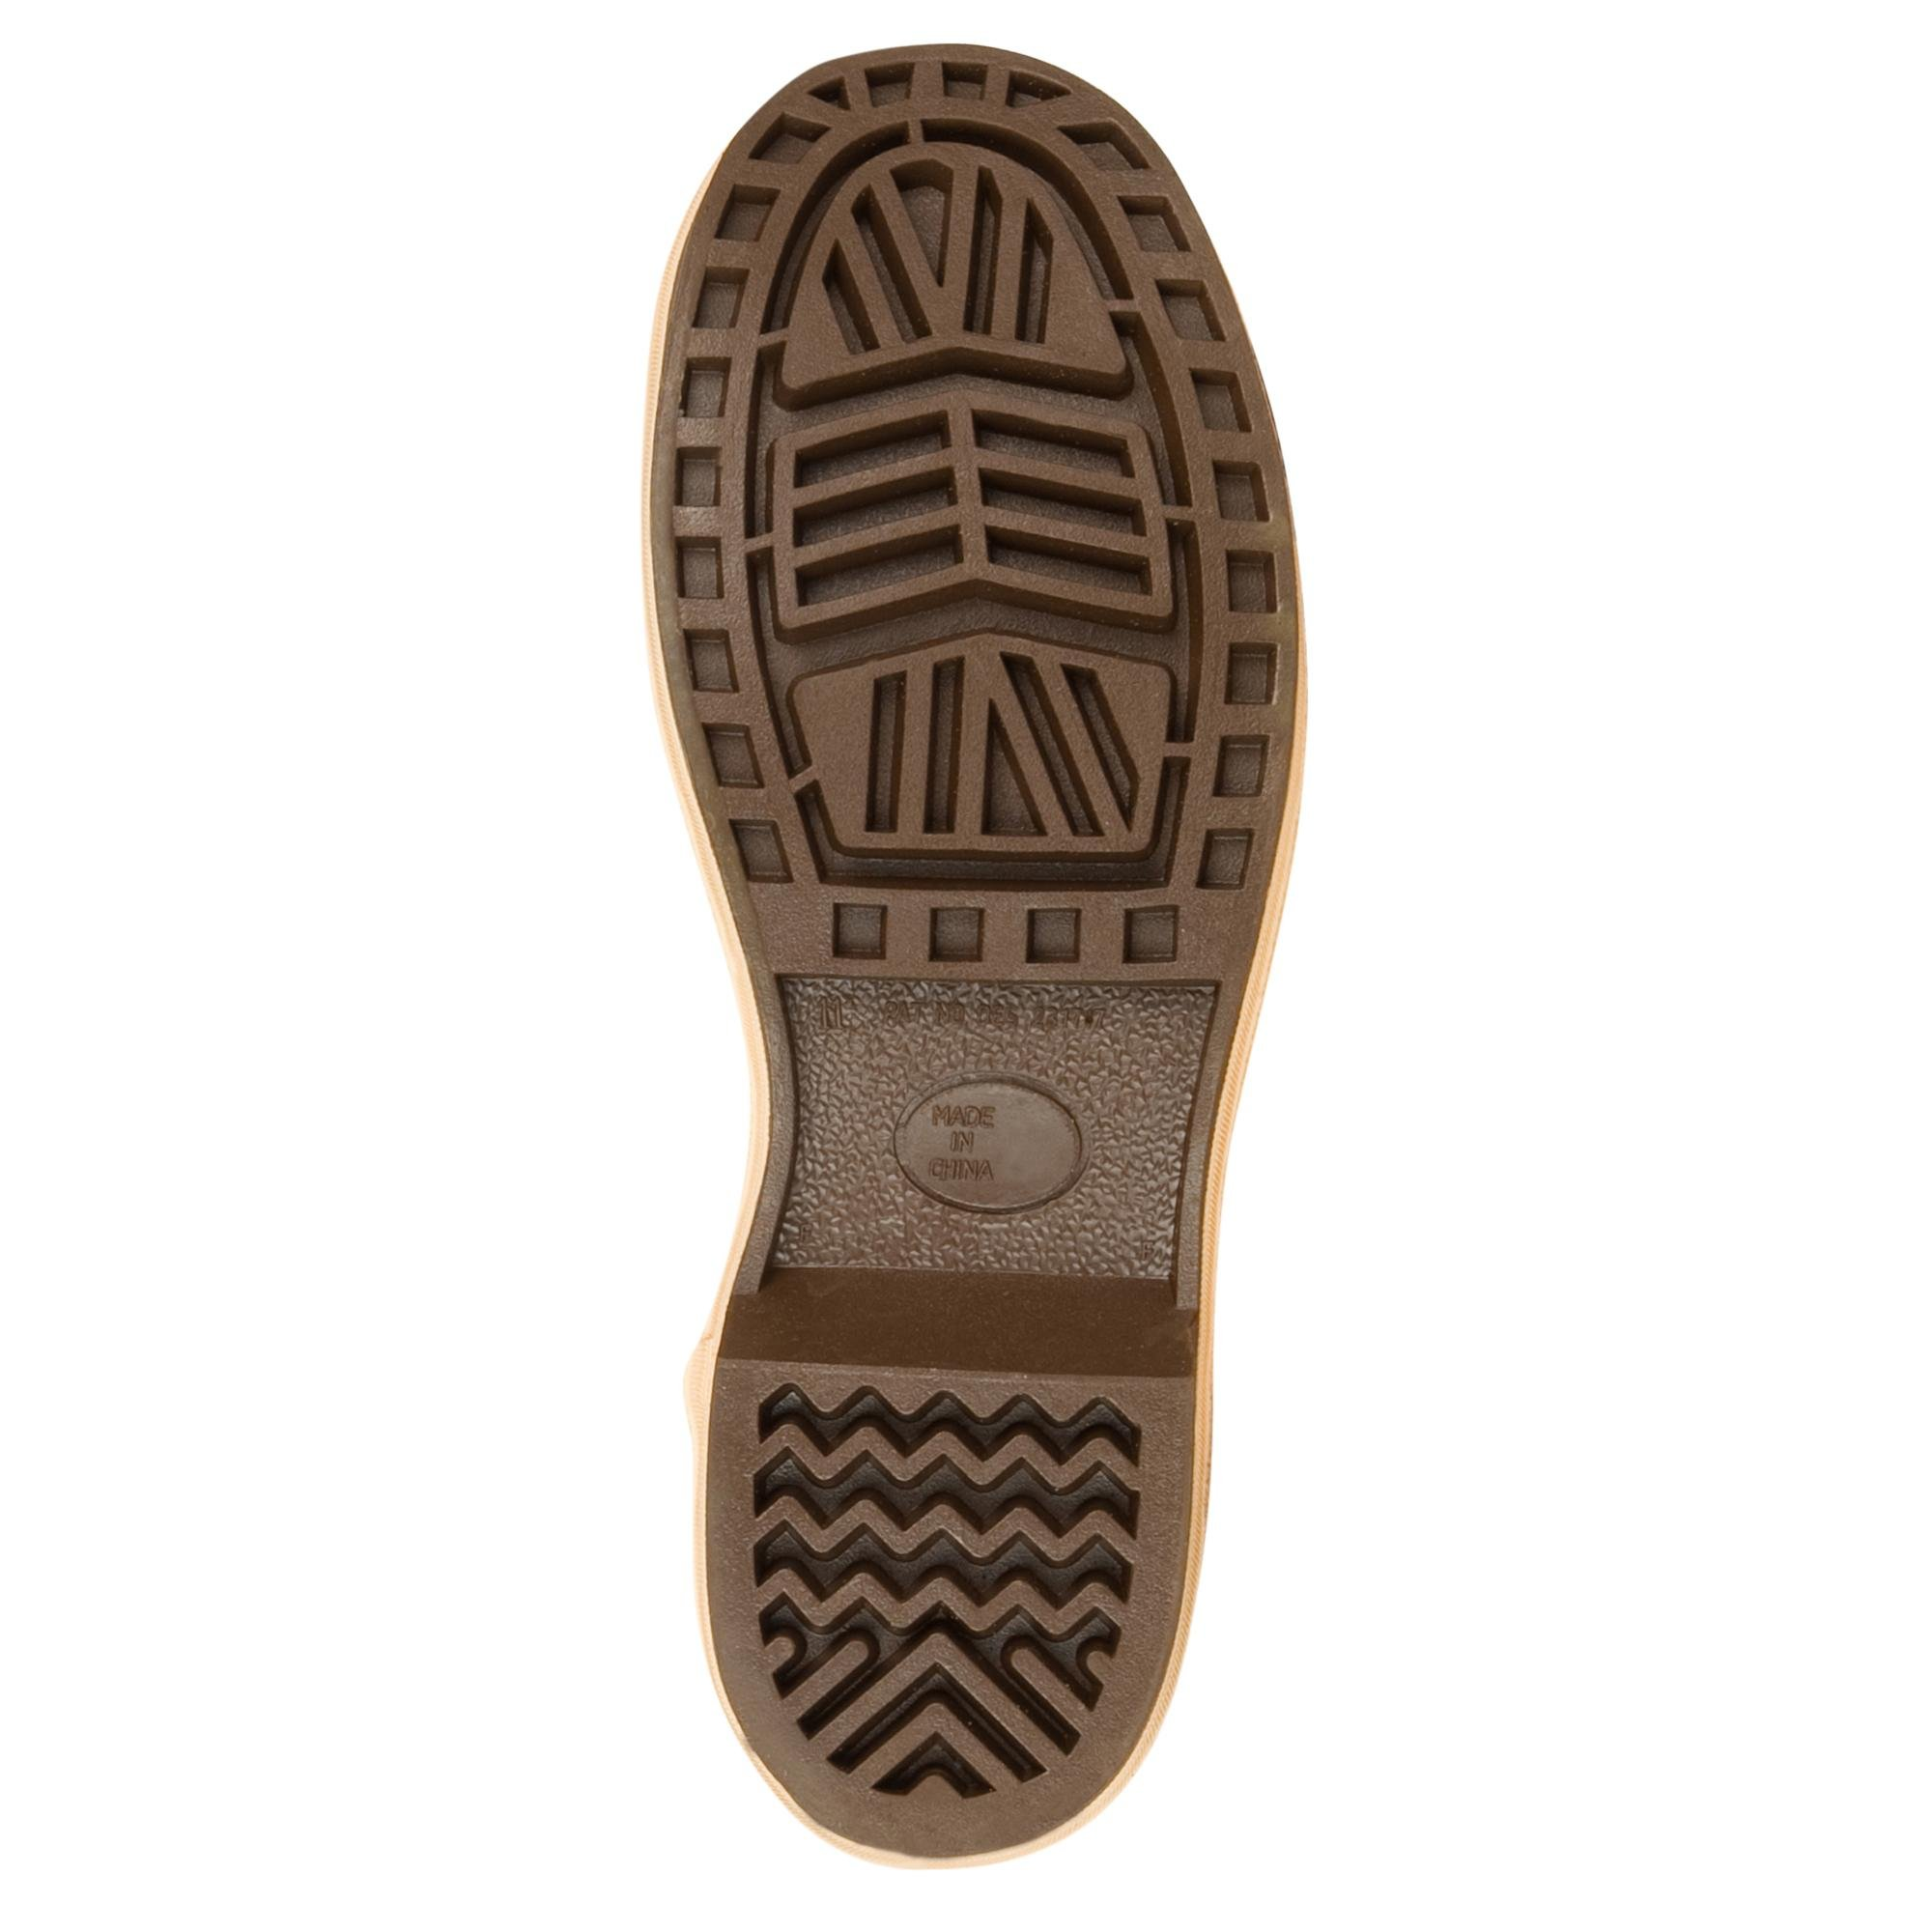 XTRATUF Legacy Series 15'' Neoprene Steel Toe Insulated Men's Fishing Boots, Copper & Tan (22273G) by Xtratuf (Image #3)